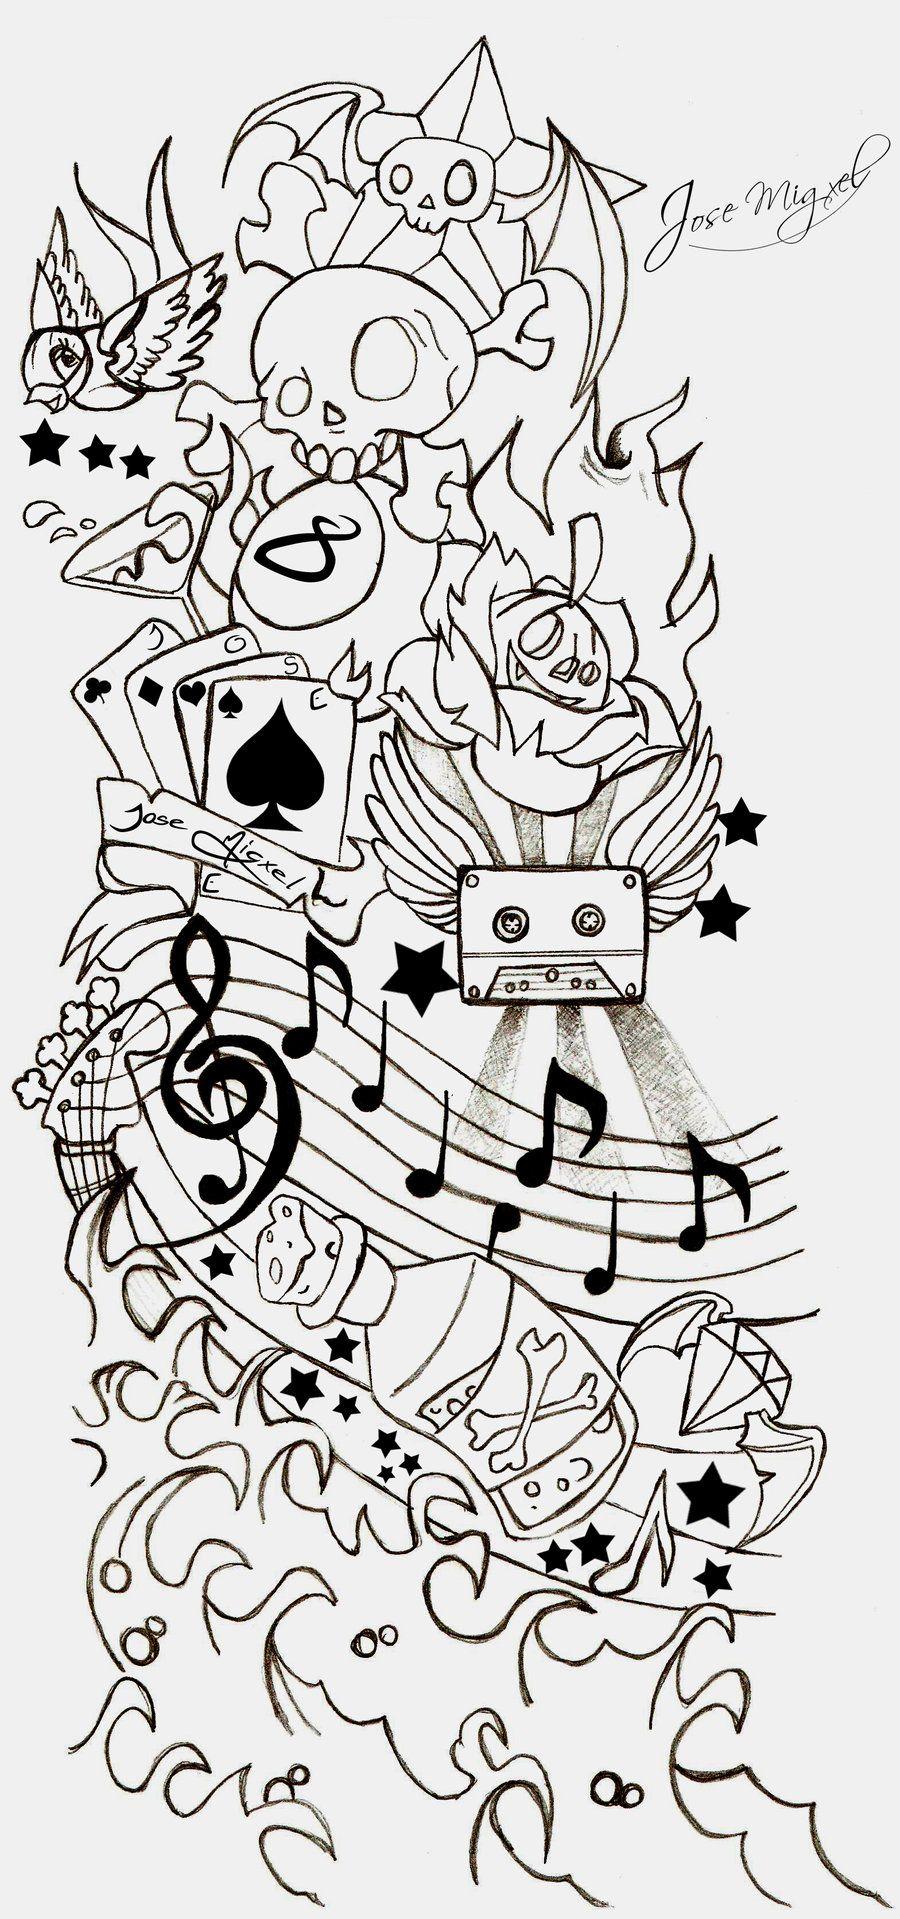 tattoo drawings Tattoo Ideas 2015 Tattoo drawings, New